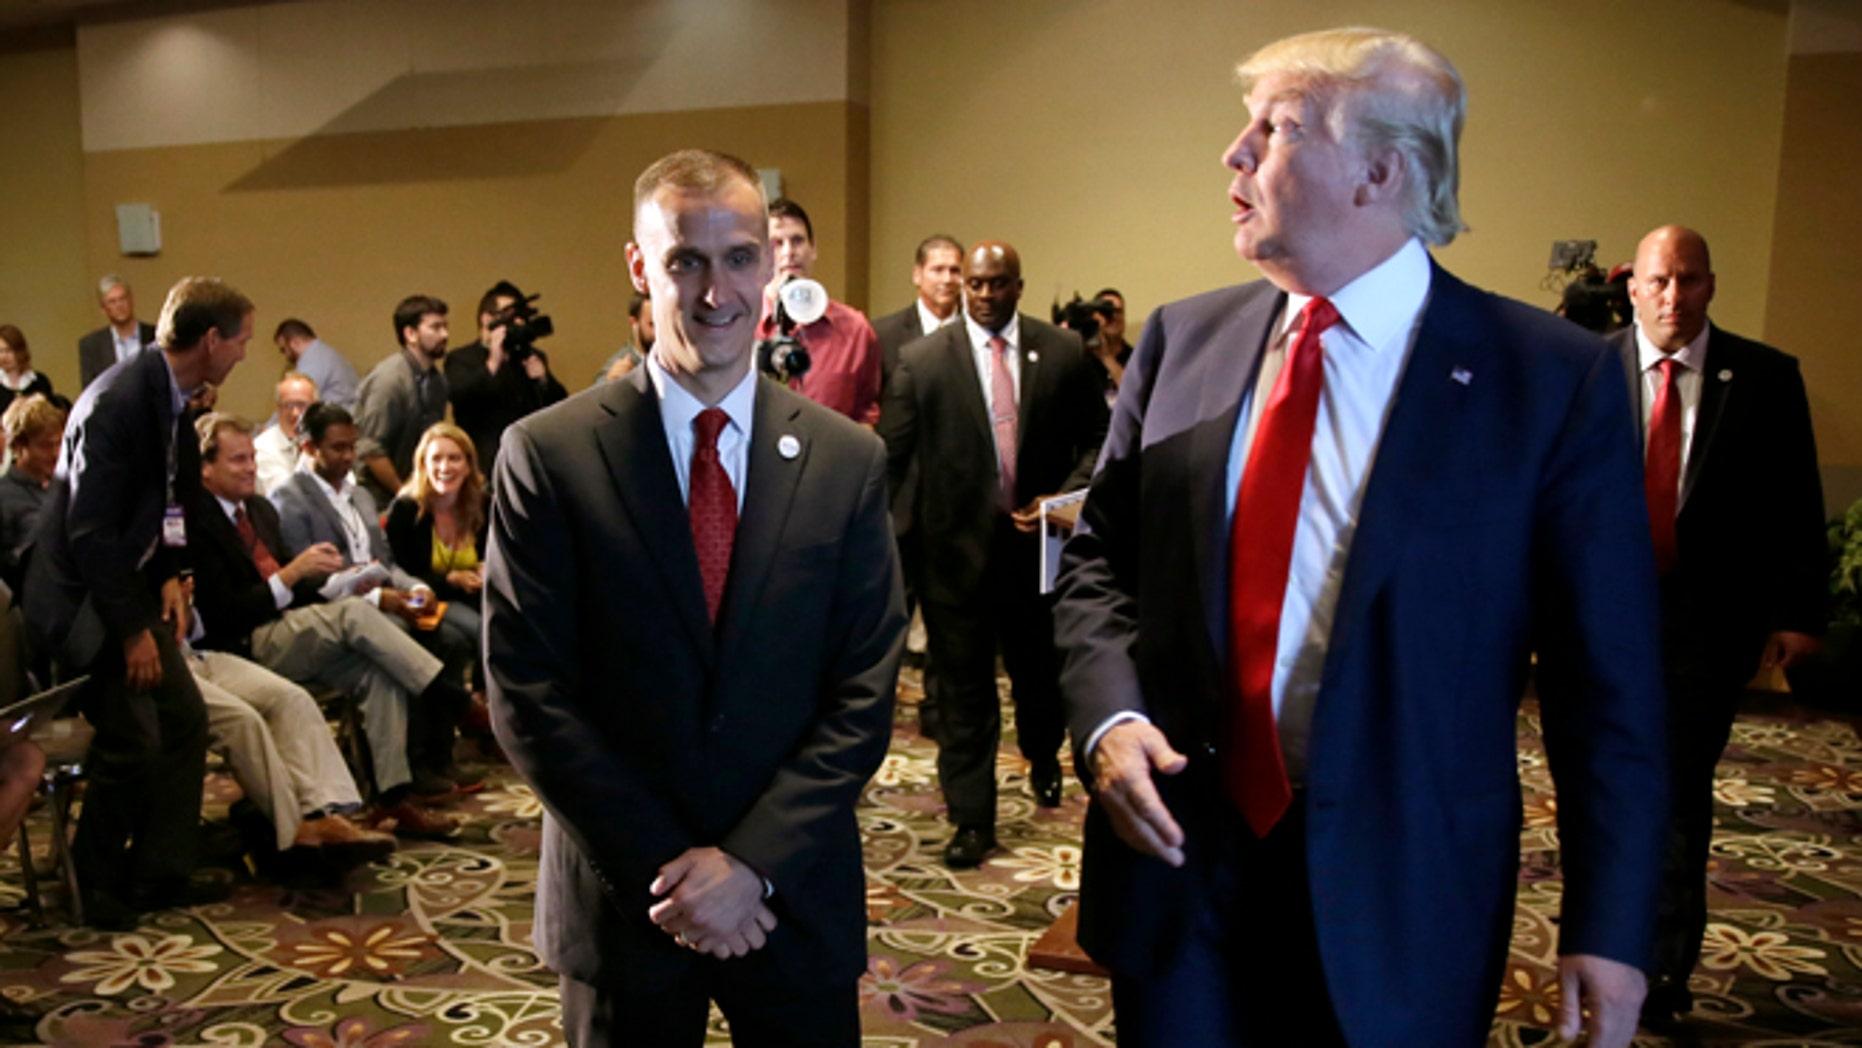 Republican candidate Donald Trump and campaign manager Corey Lewandowski in a 2015 file photo.